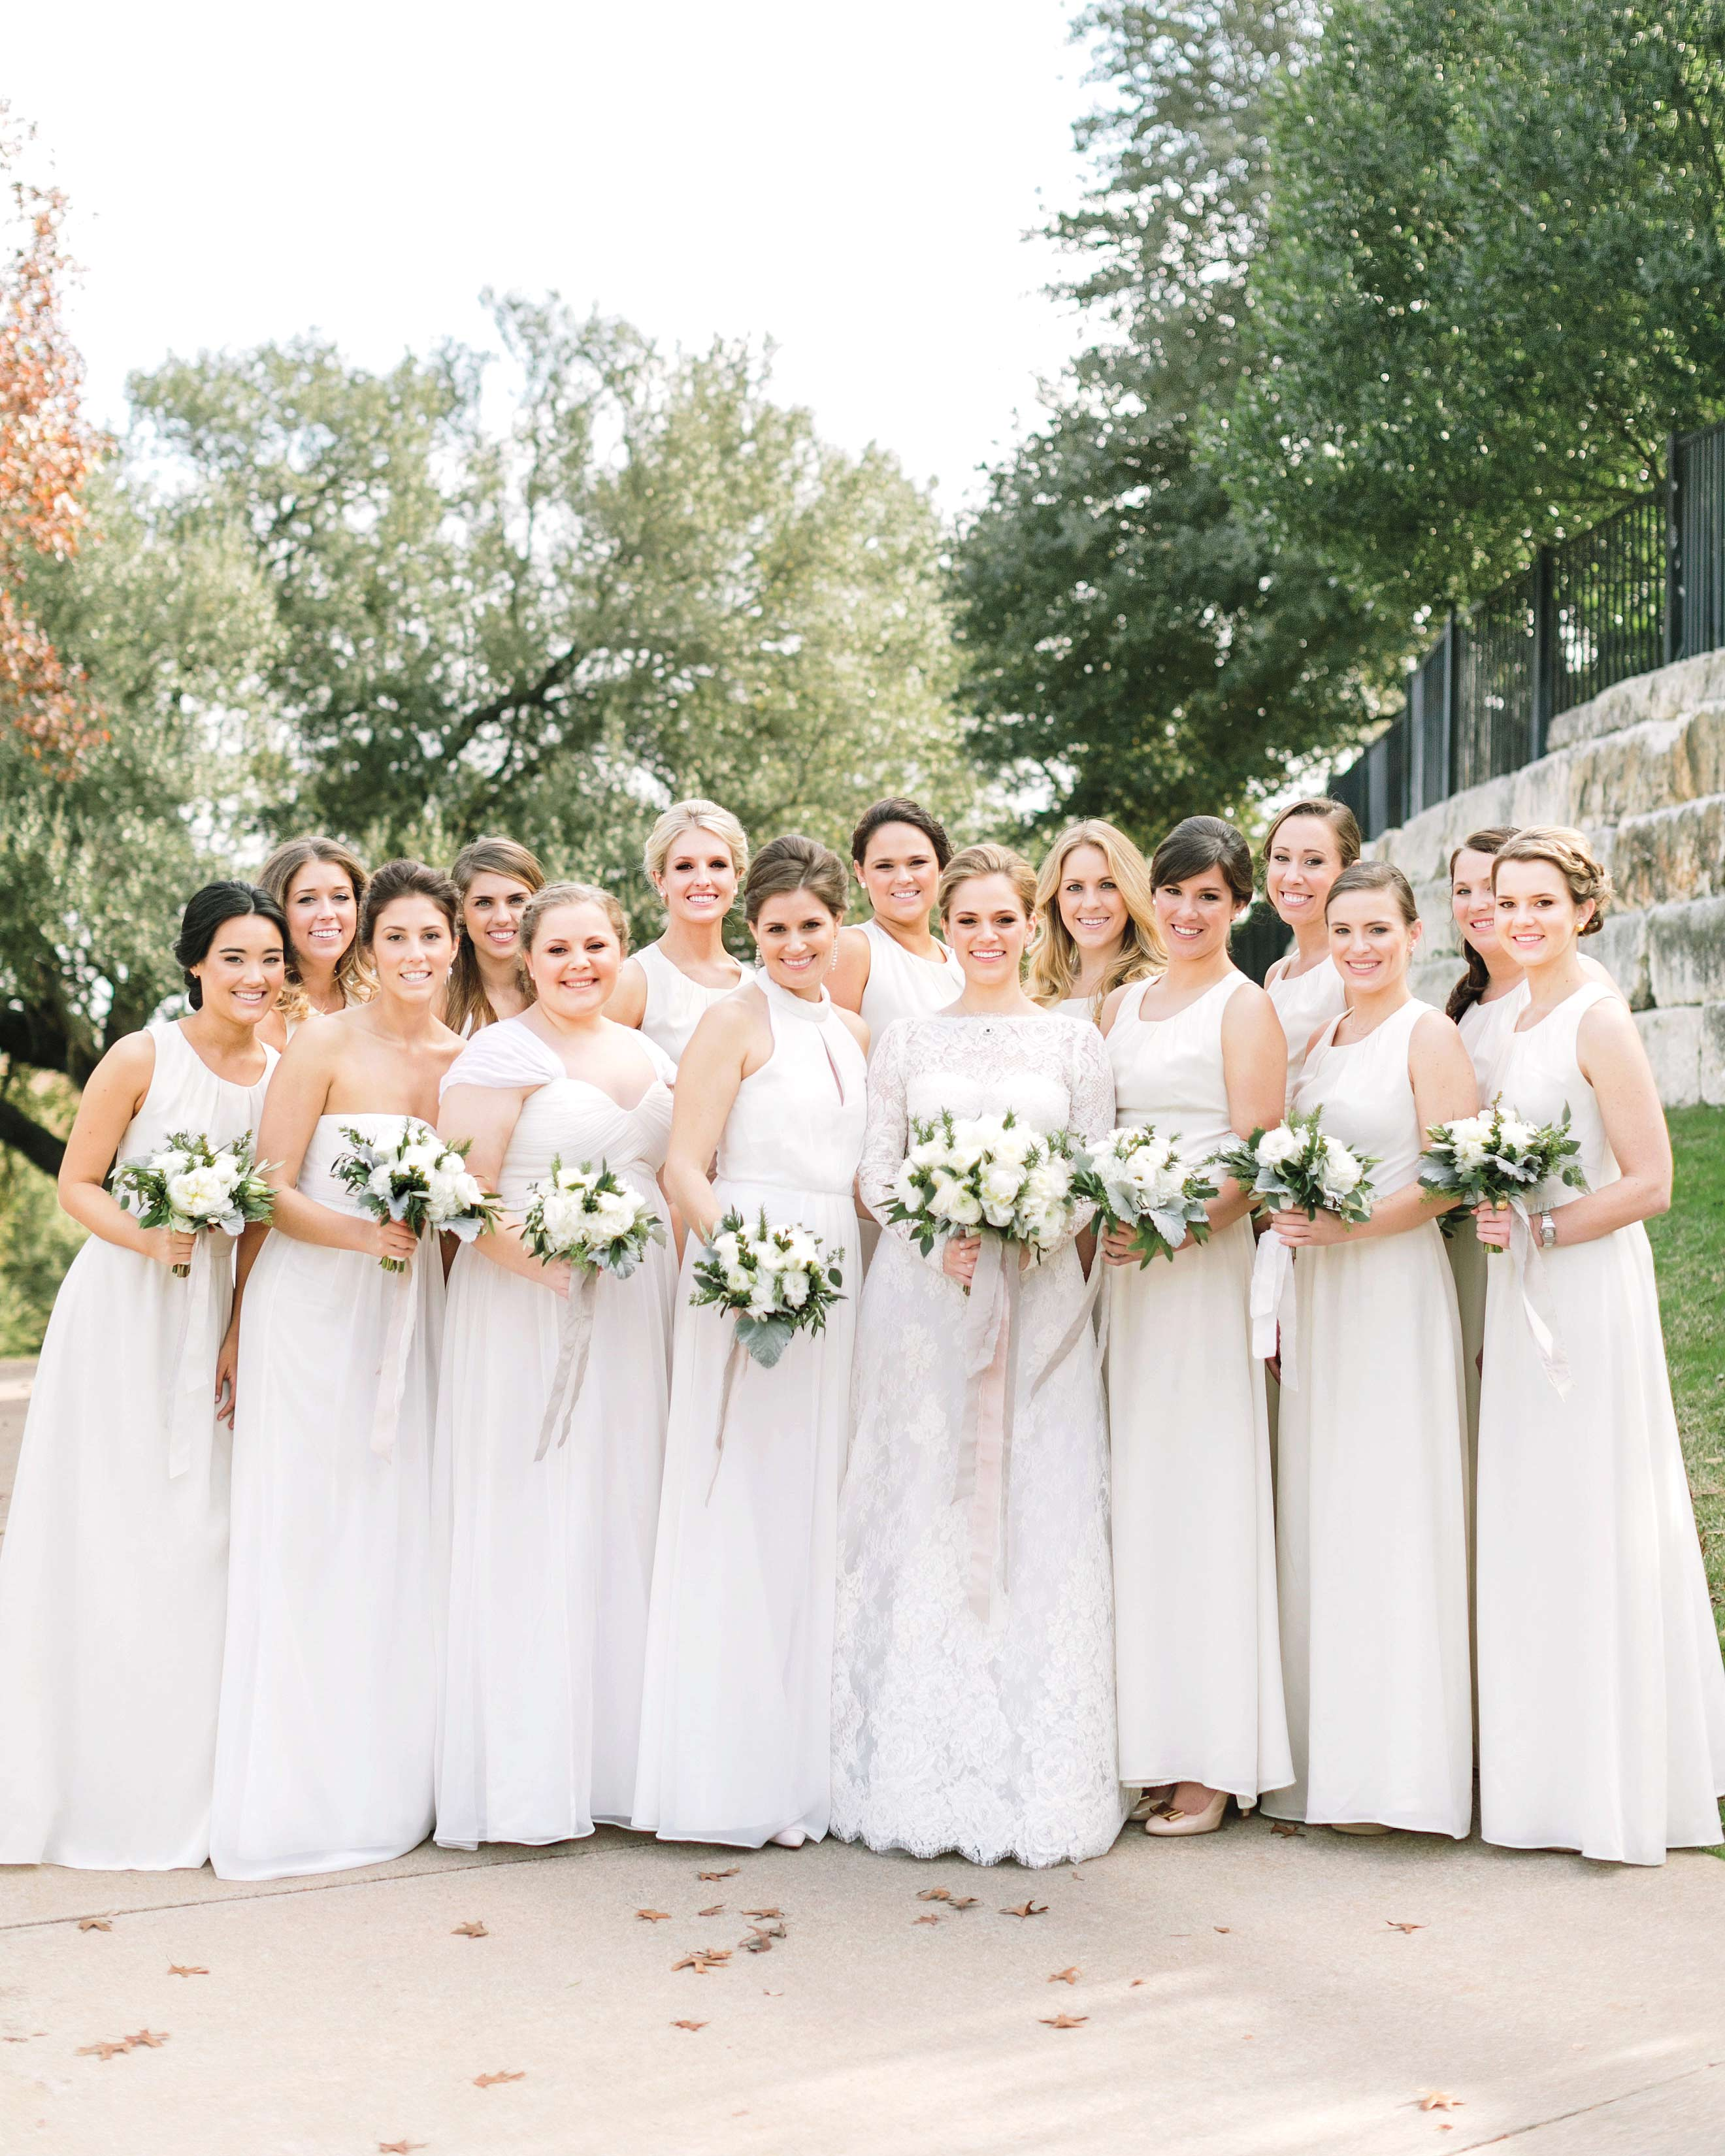 mmallory-diego-wedding-texas-bridesmaids-white-dresses-057-s112628.jpg